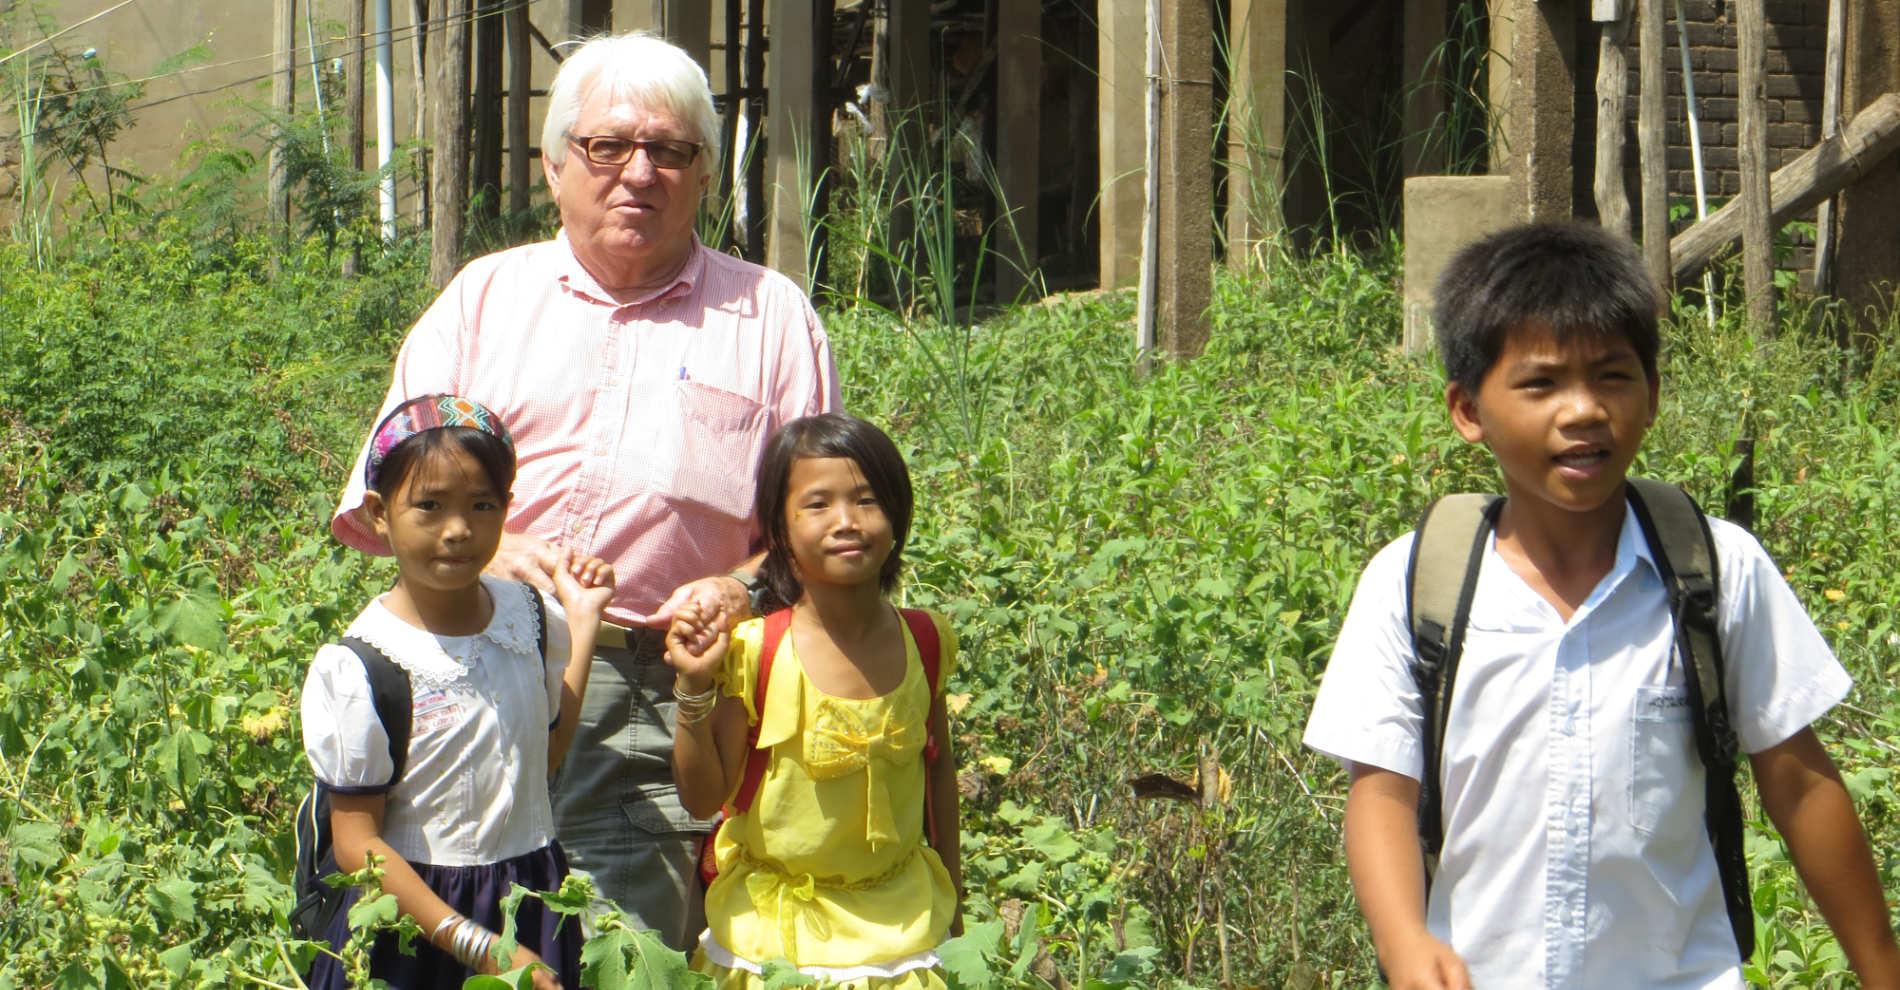 Traveling Apostles Walking With Children